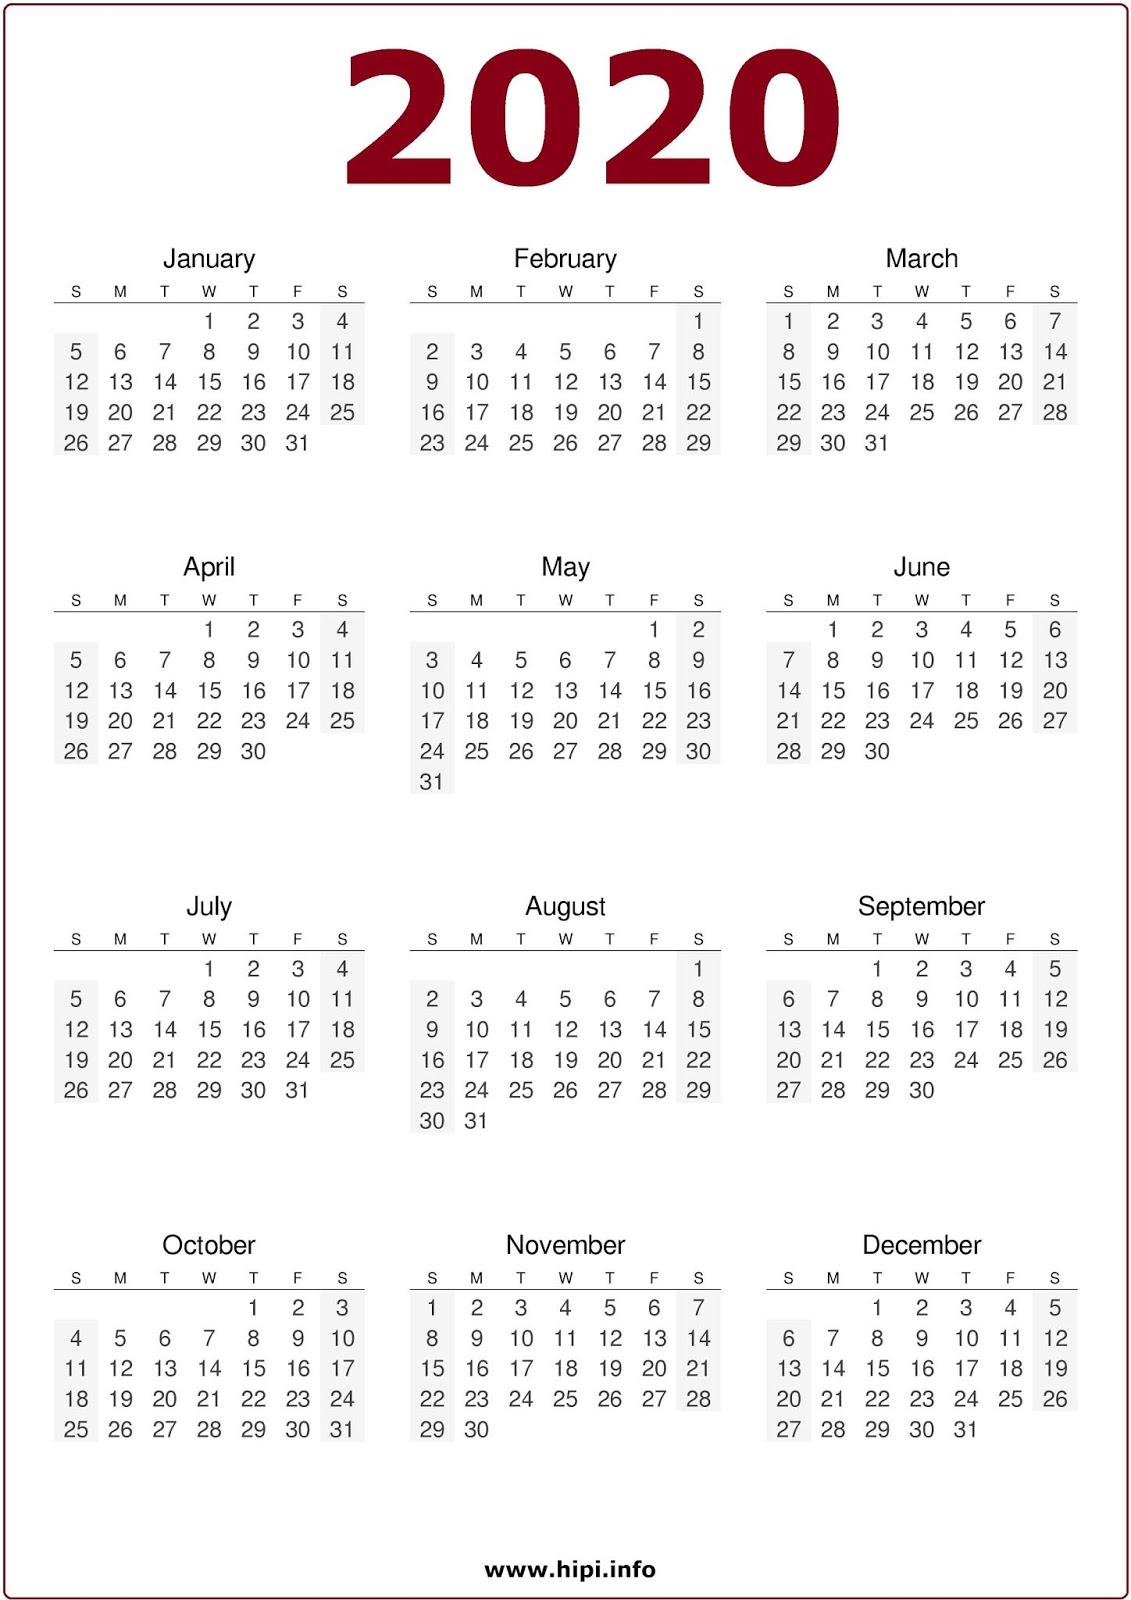 Printable 2020 Calendar One Page.Calendars Printable Twitter Headers Facebook Covers